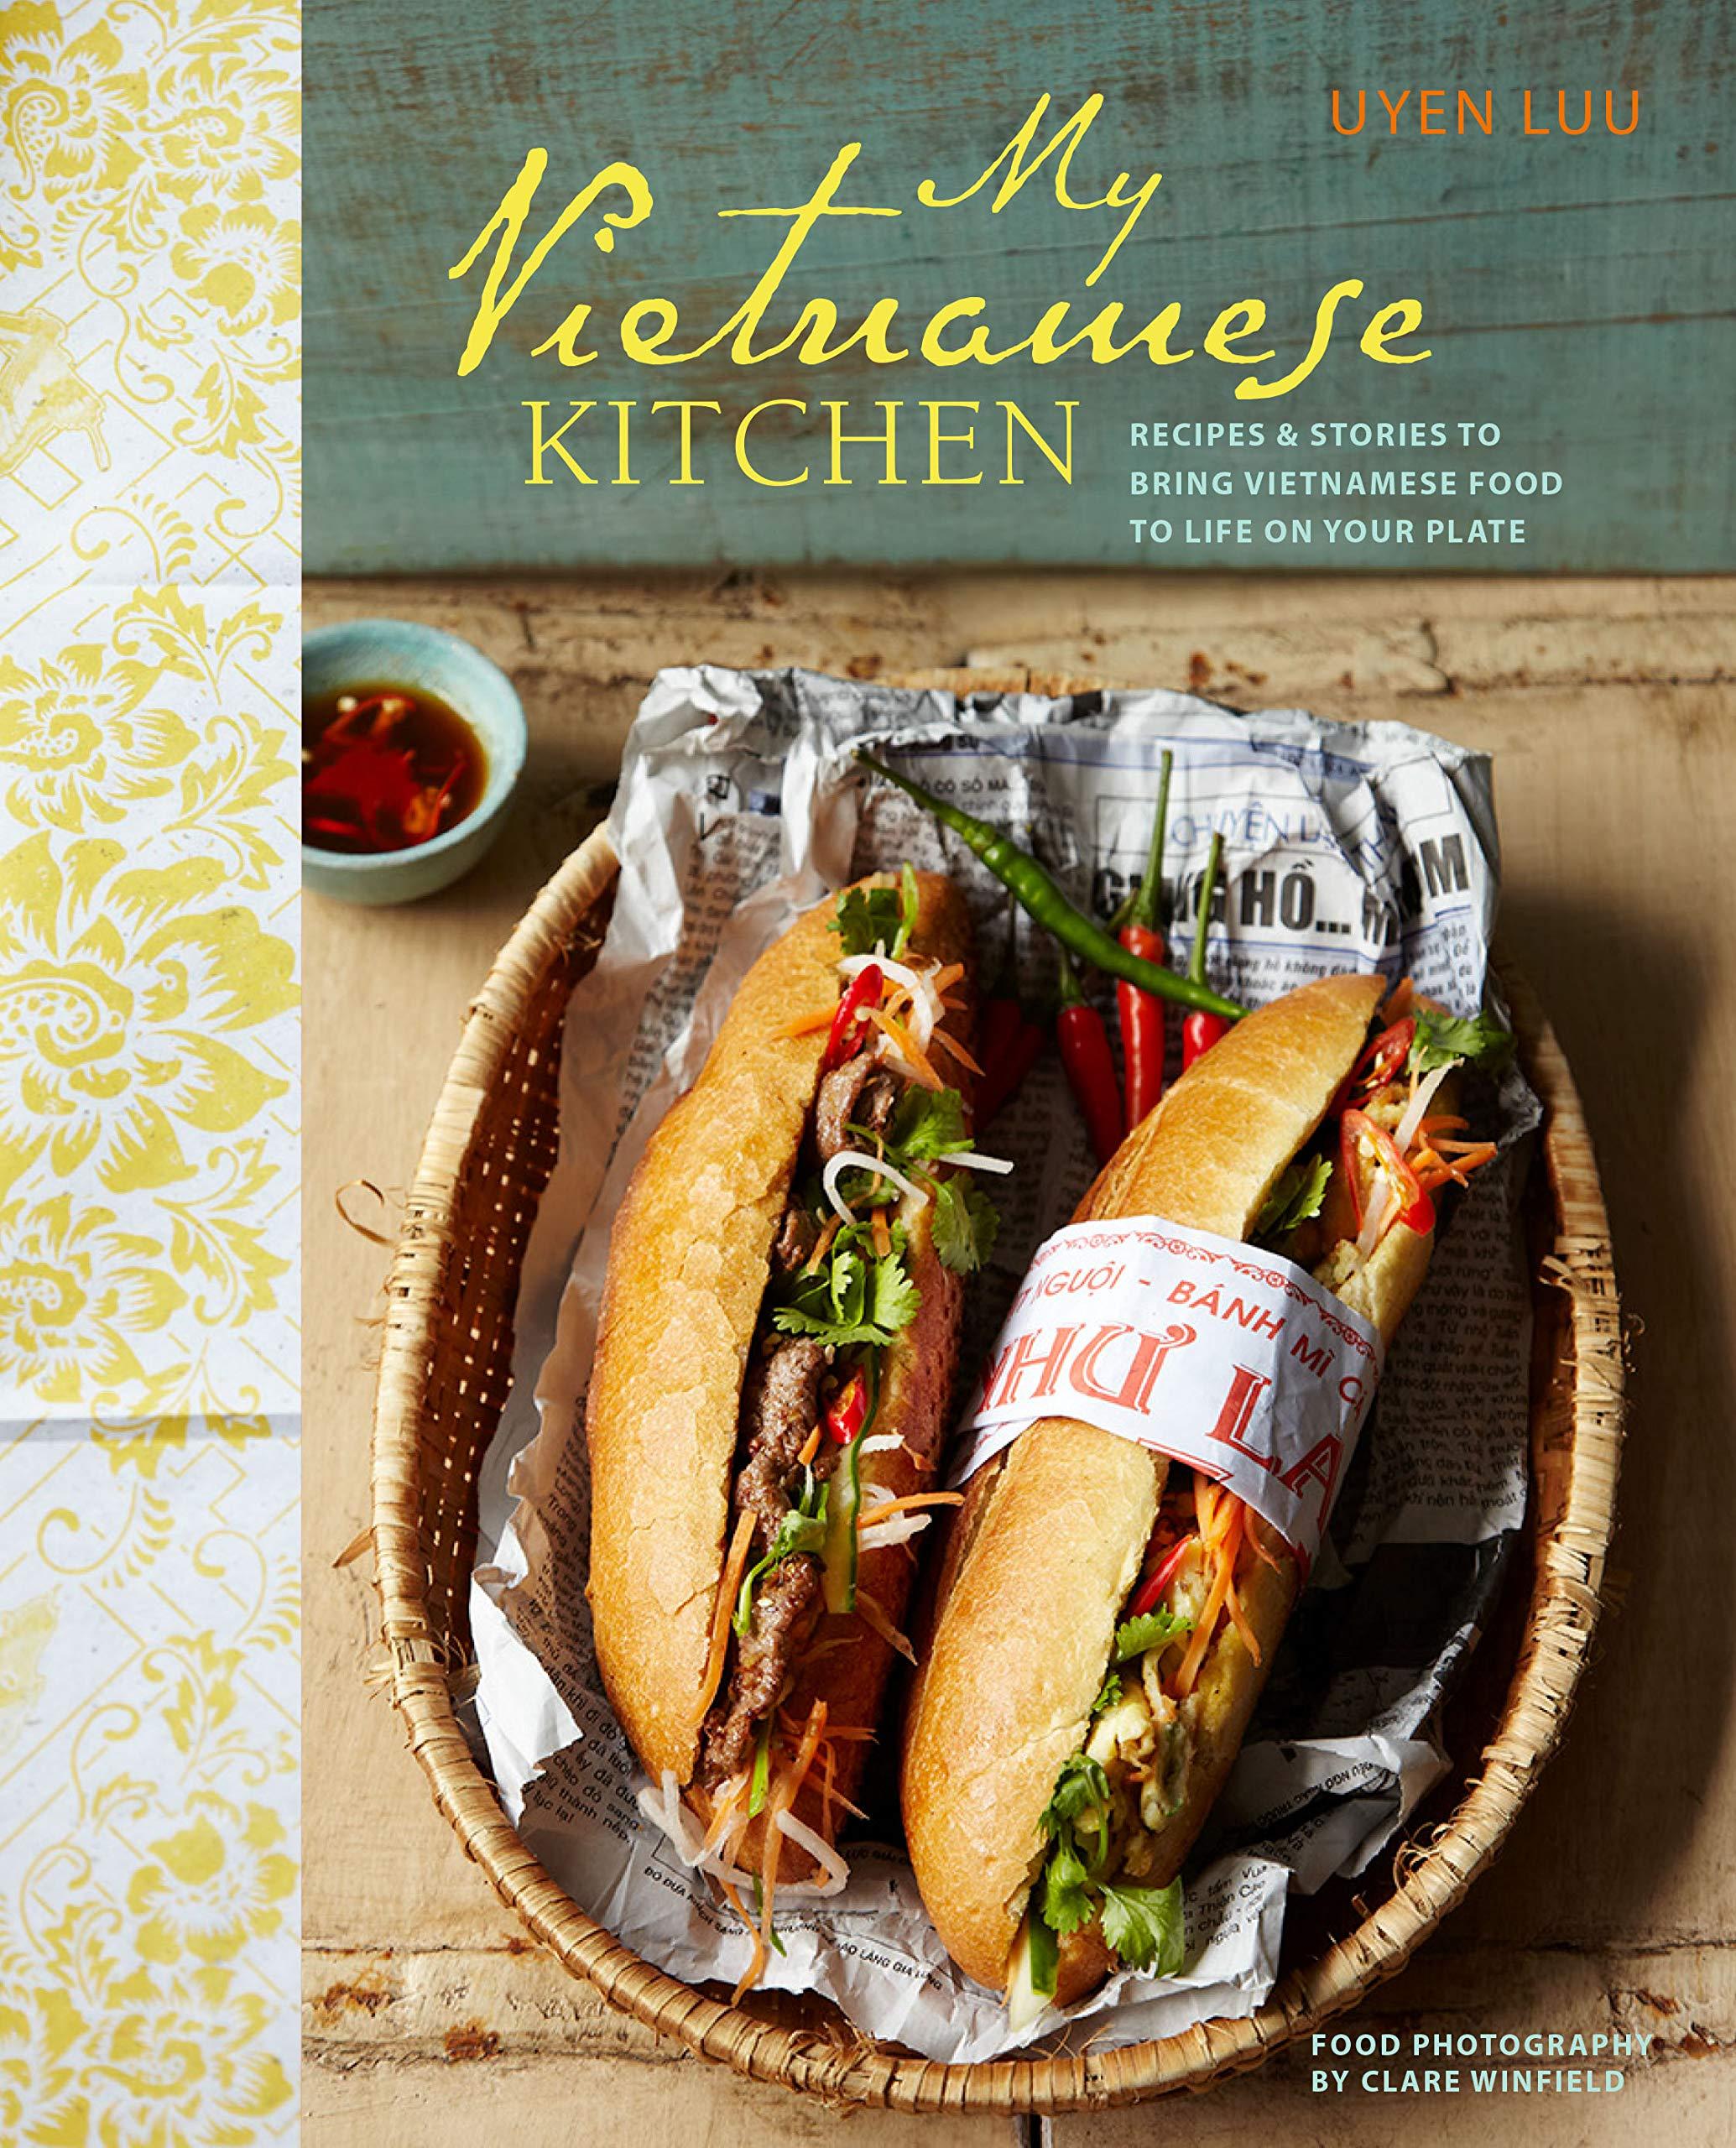 My Vietnamese Kitchen Recipes And Stories To Bring Vietnamese Food To Life On Your Plate Luu Uyen Amazon De Bucher